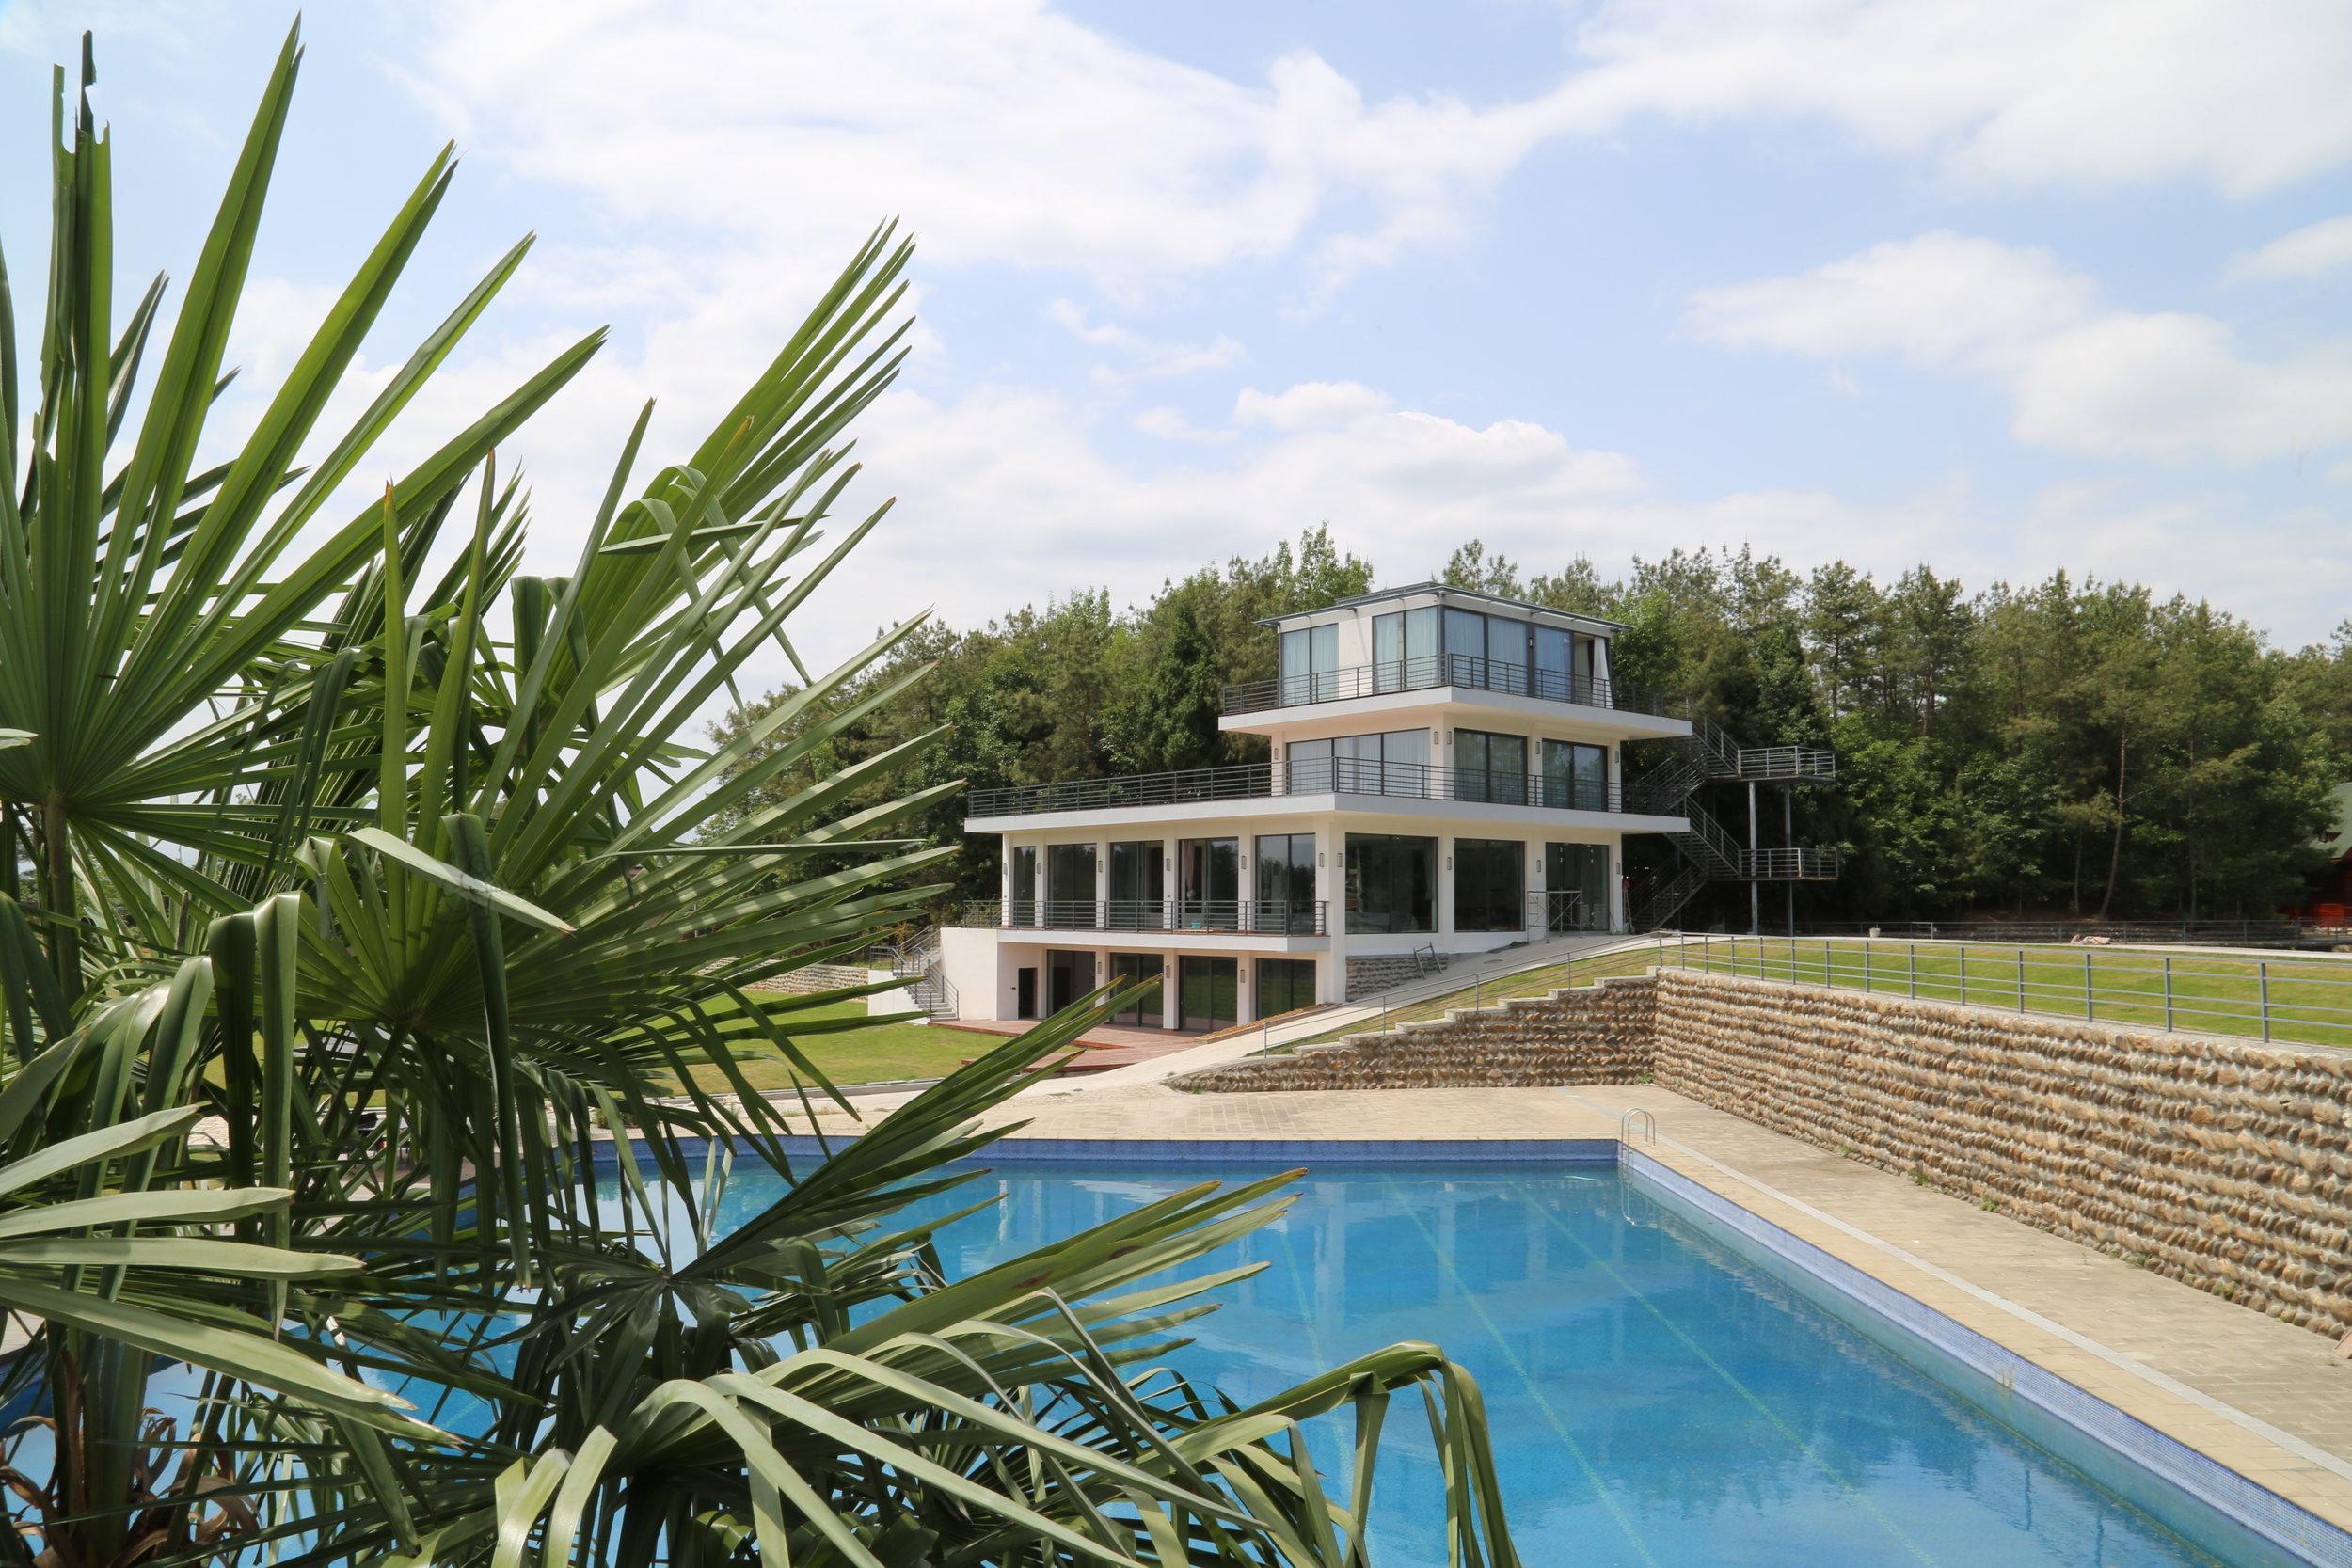 Walden farm swimming pool villa